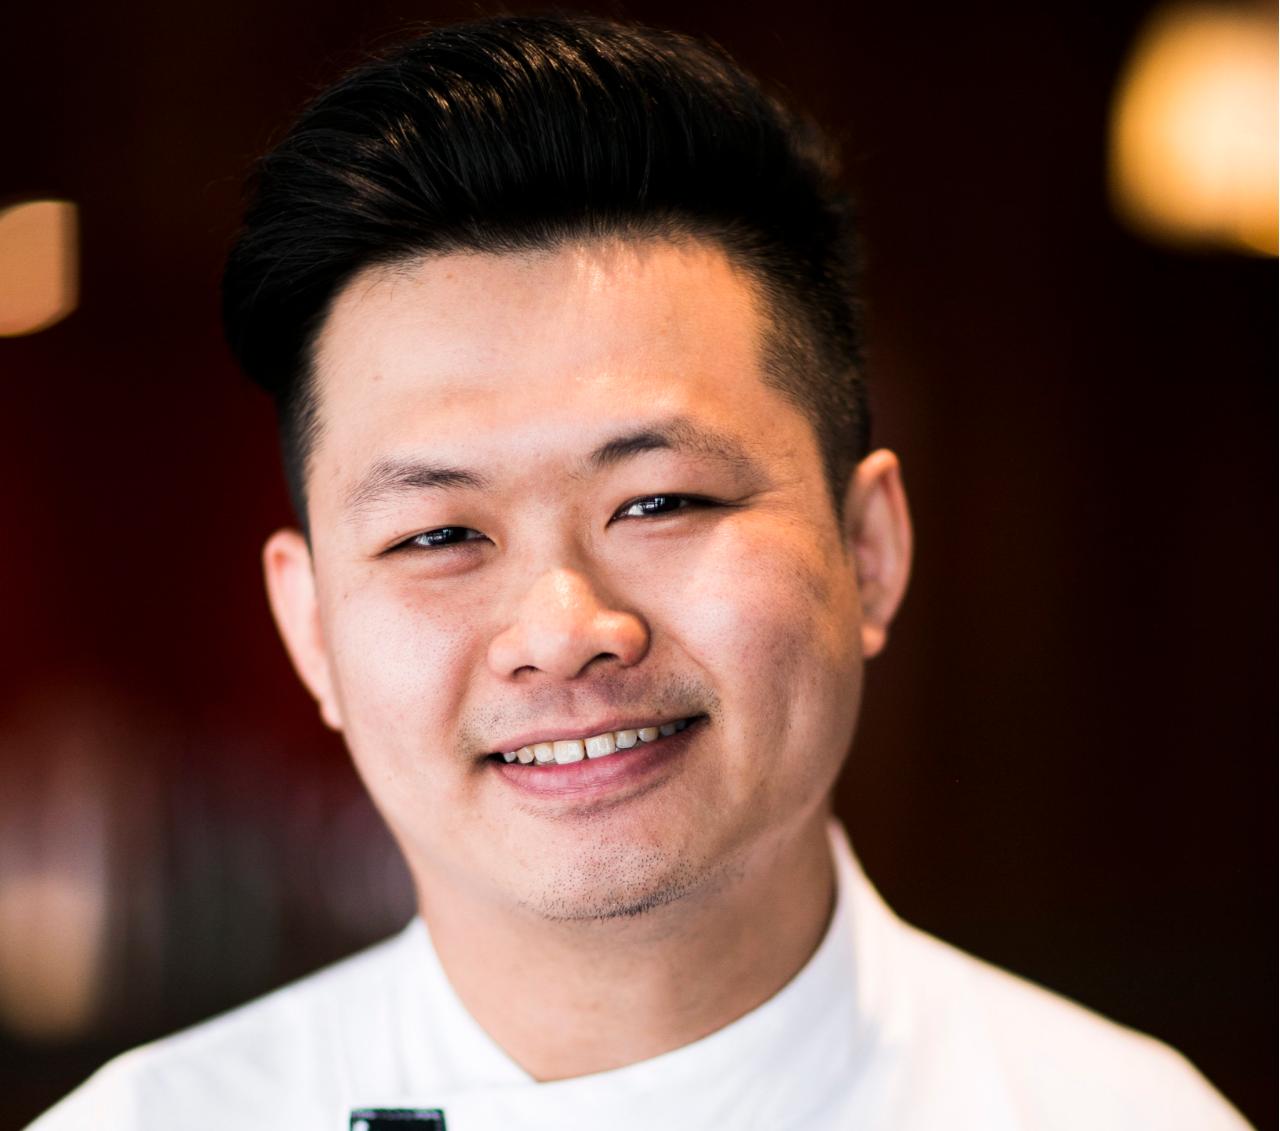 Head Chef of Viio Gastropub, Singapore